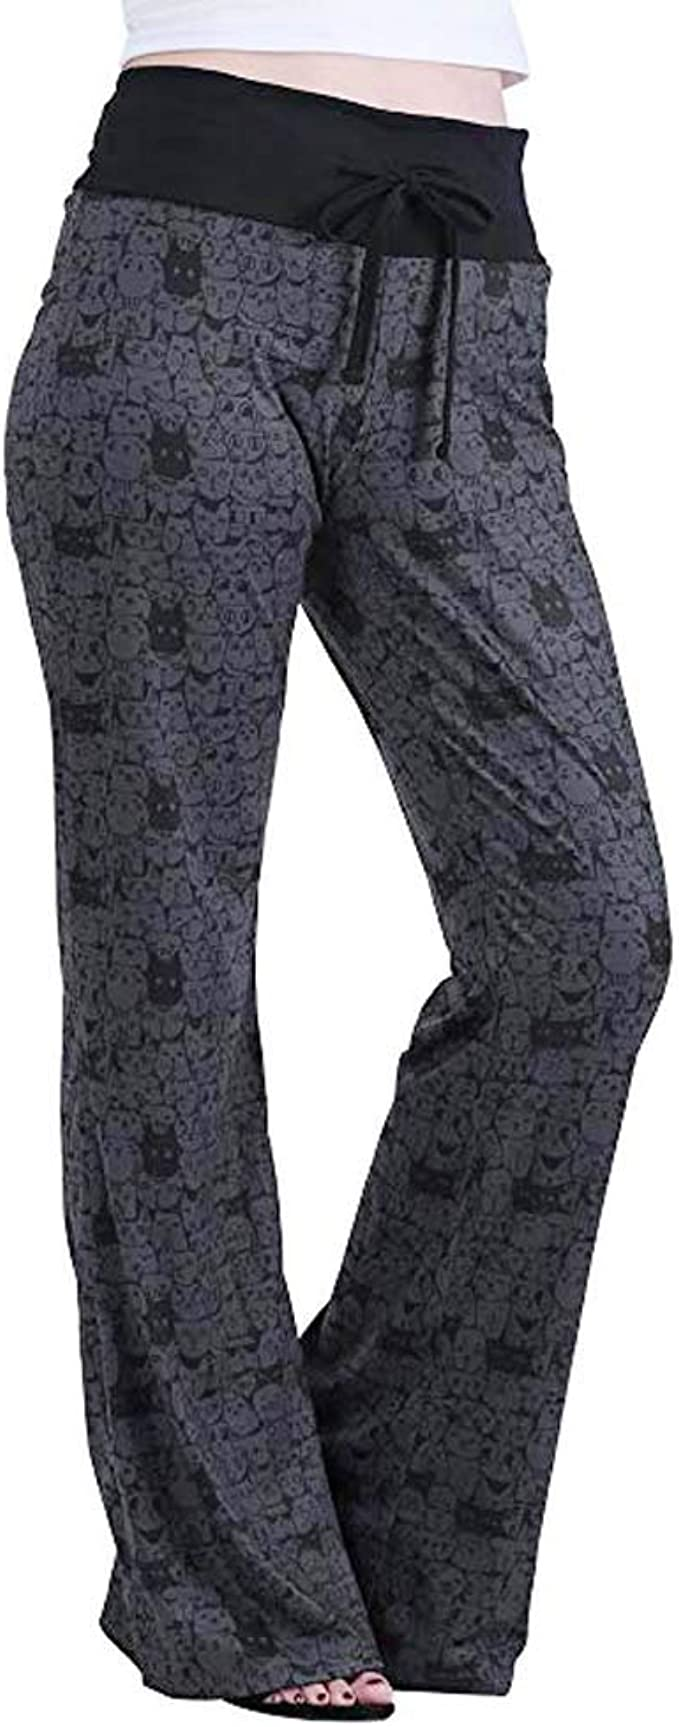 ZSBAYU Women Comfy Casual Pajama Pants High Waist Stretch Floral Print Drawstring Palazzo Lounge Pants Wide Leg